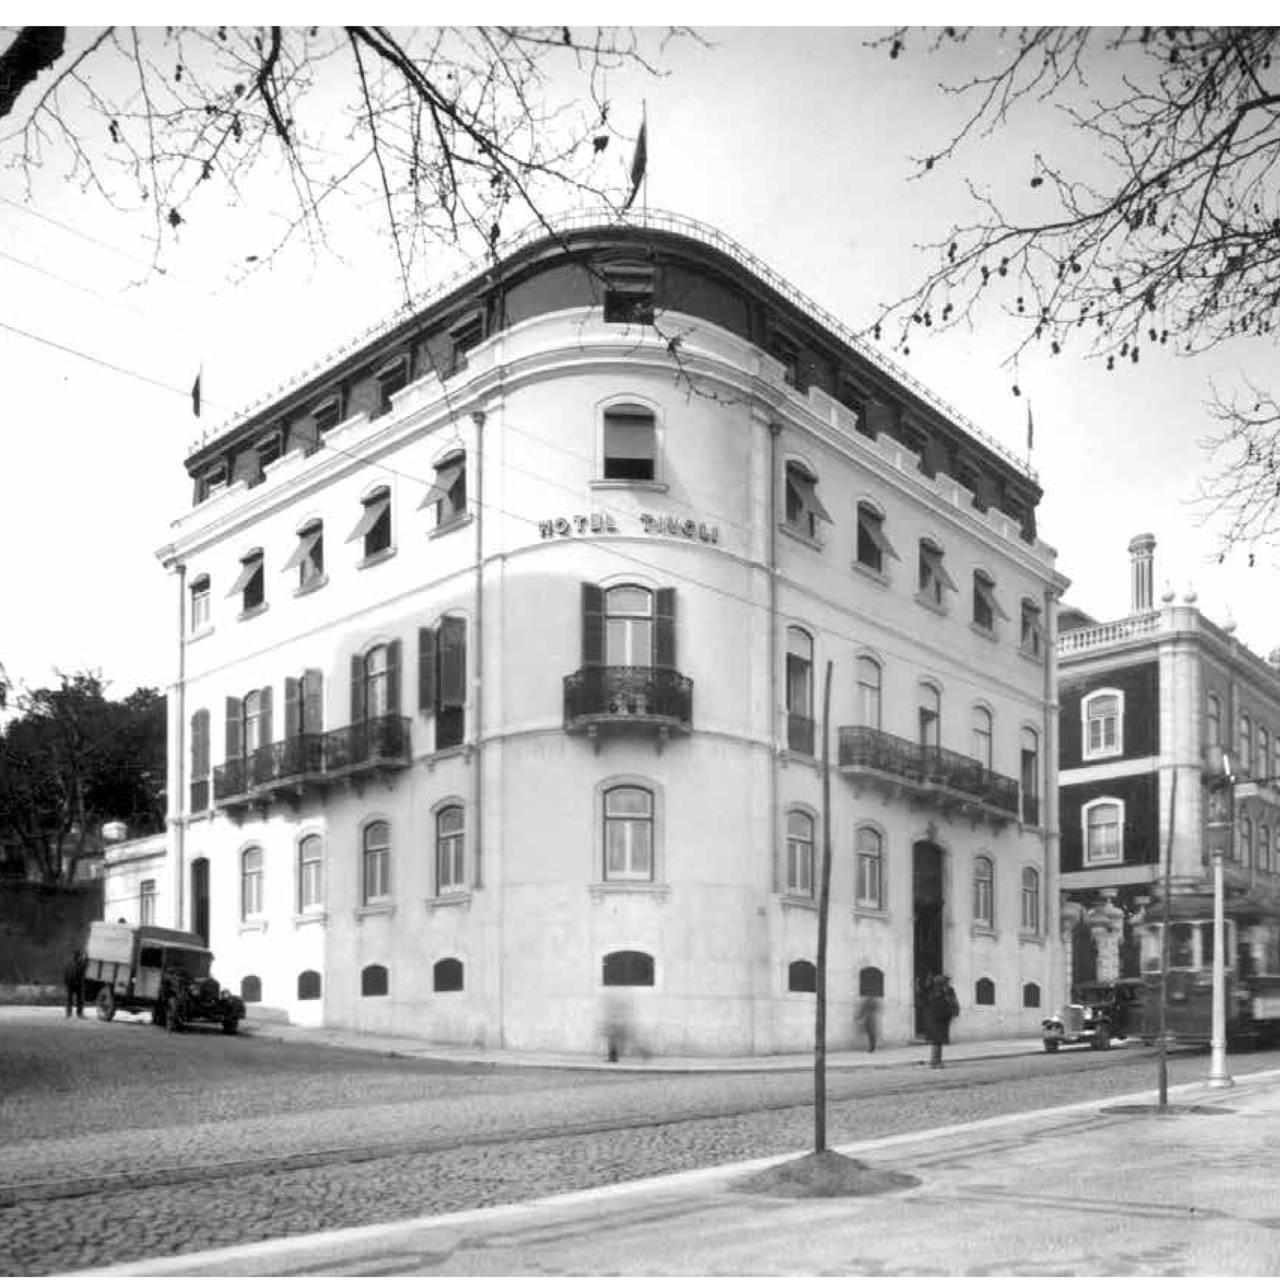 Tivoli Hotels & Resorts celebra 85 años de historia